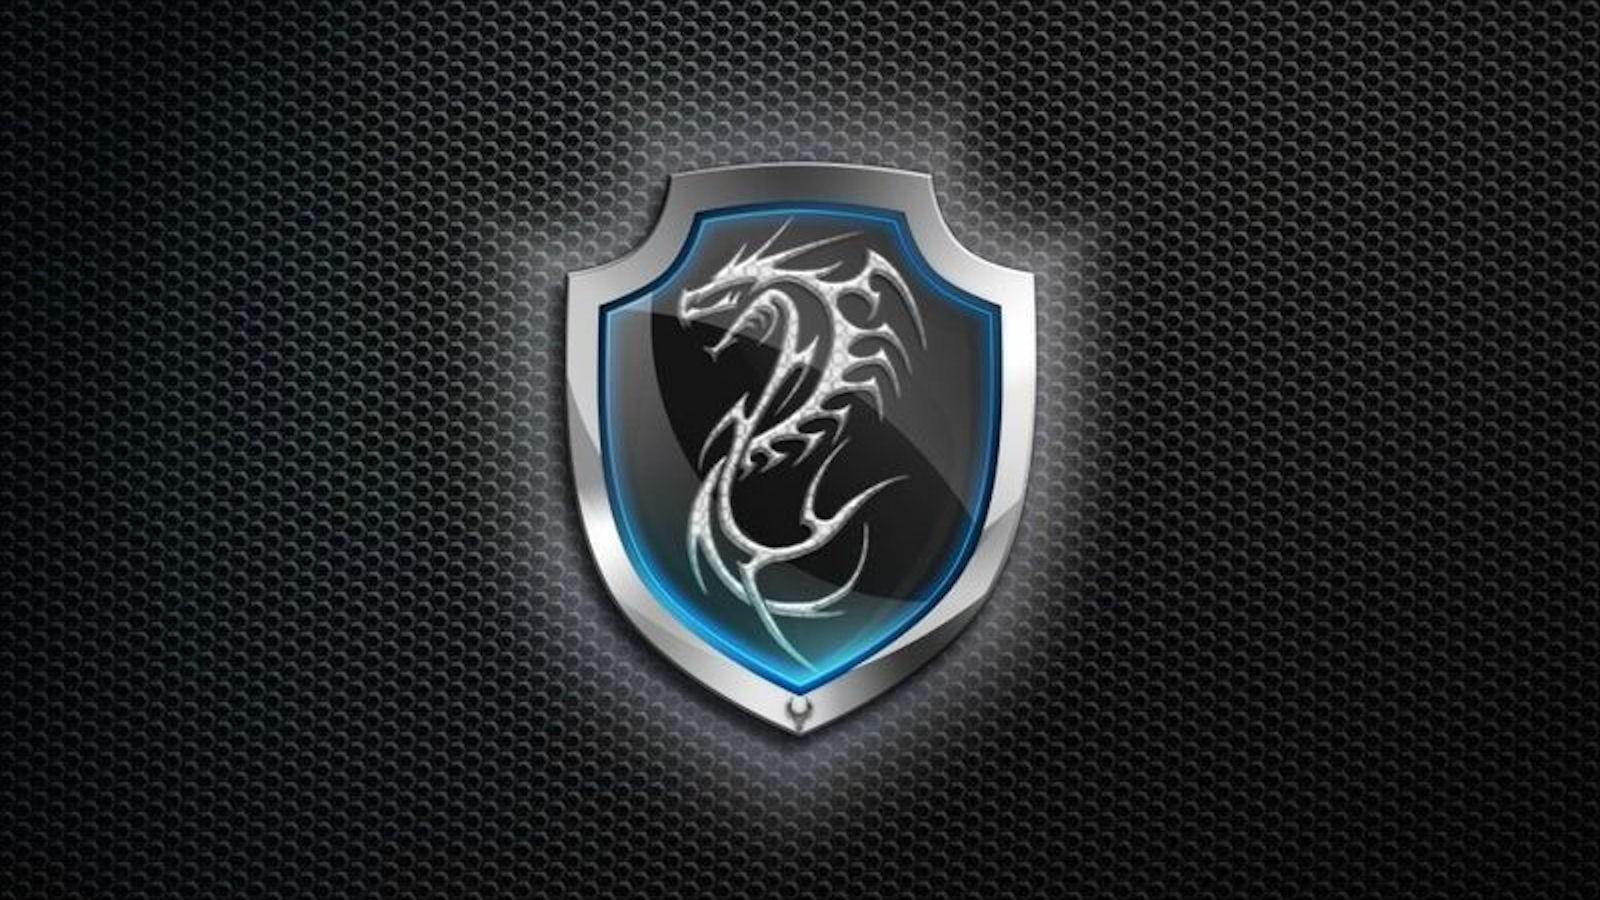 fondos de pantalla arma logo drag243n proteger marca